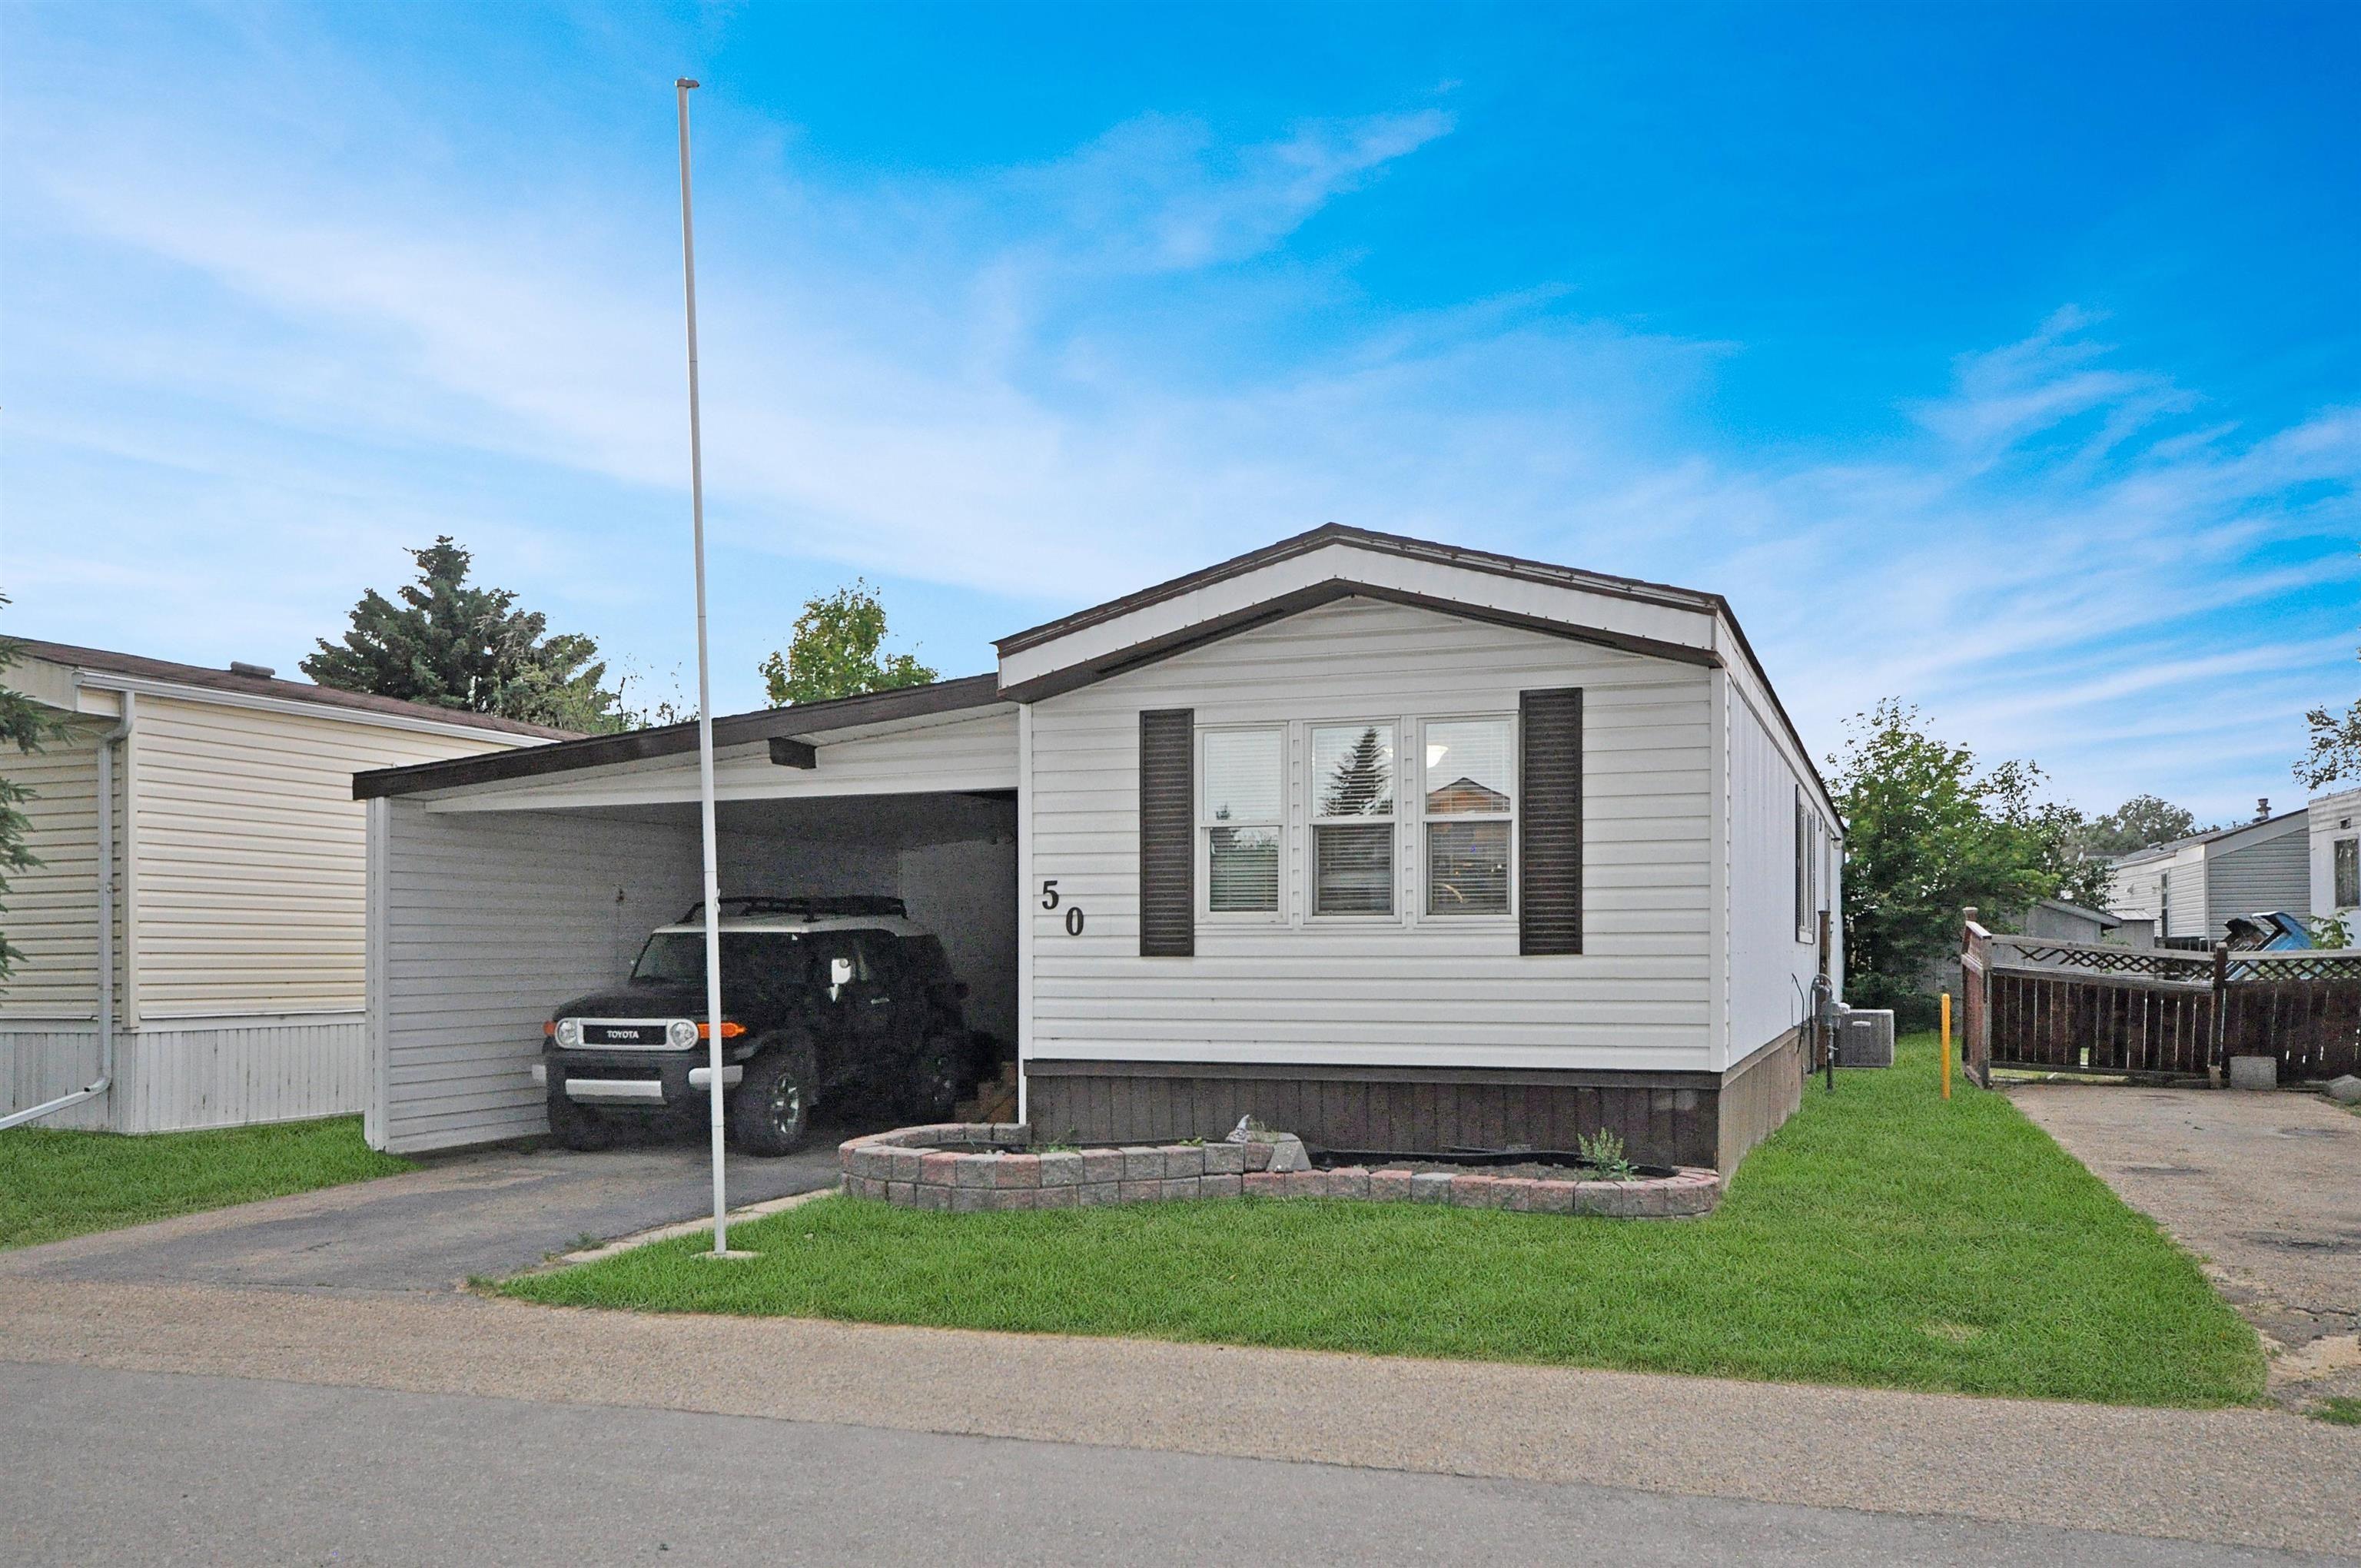 Main Photo: #50 10770 Winterburn Road in Edmonton: Zone 59 Mobile for sale : MLS®# E4263541